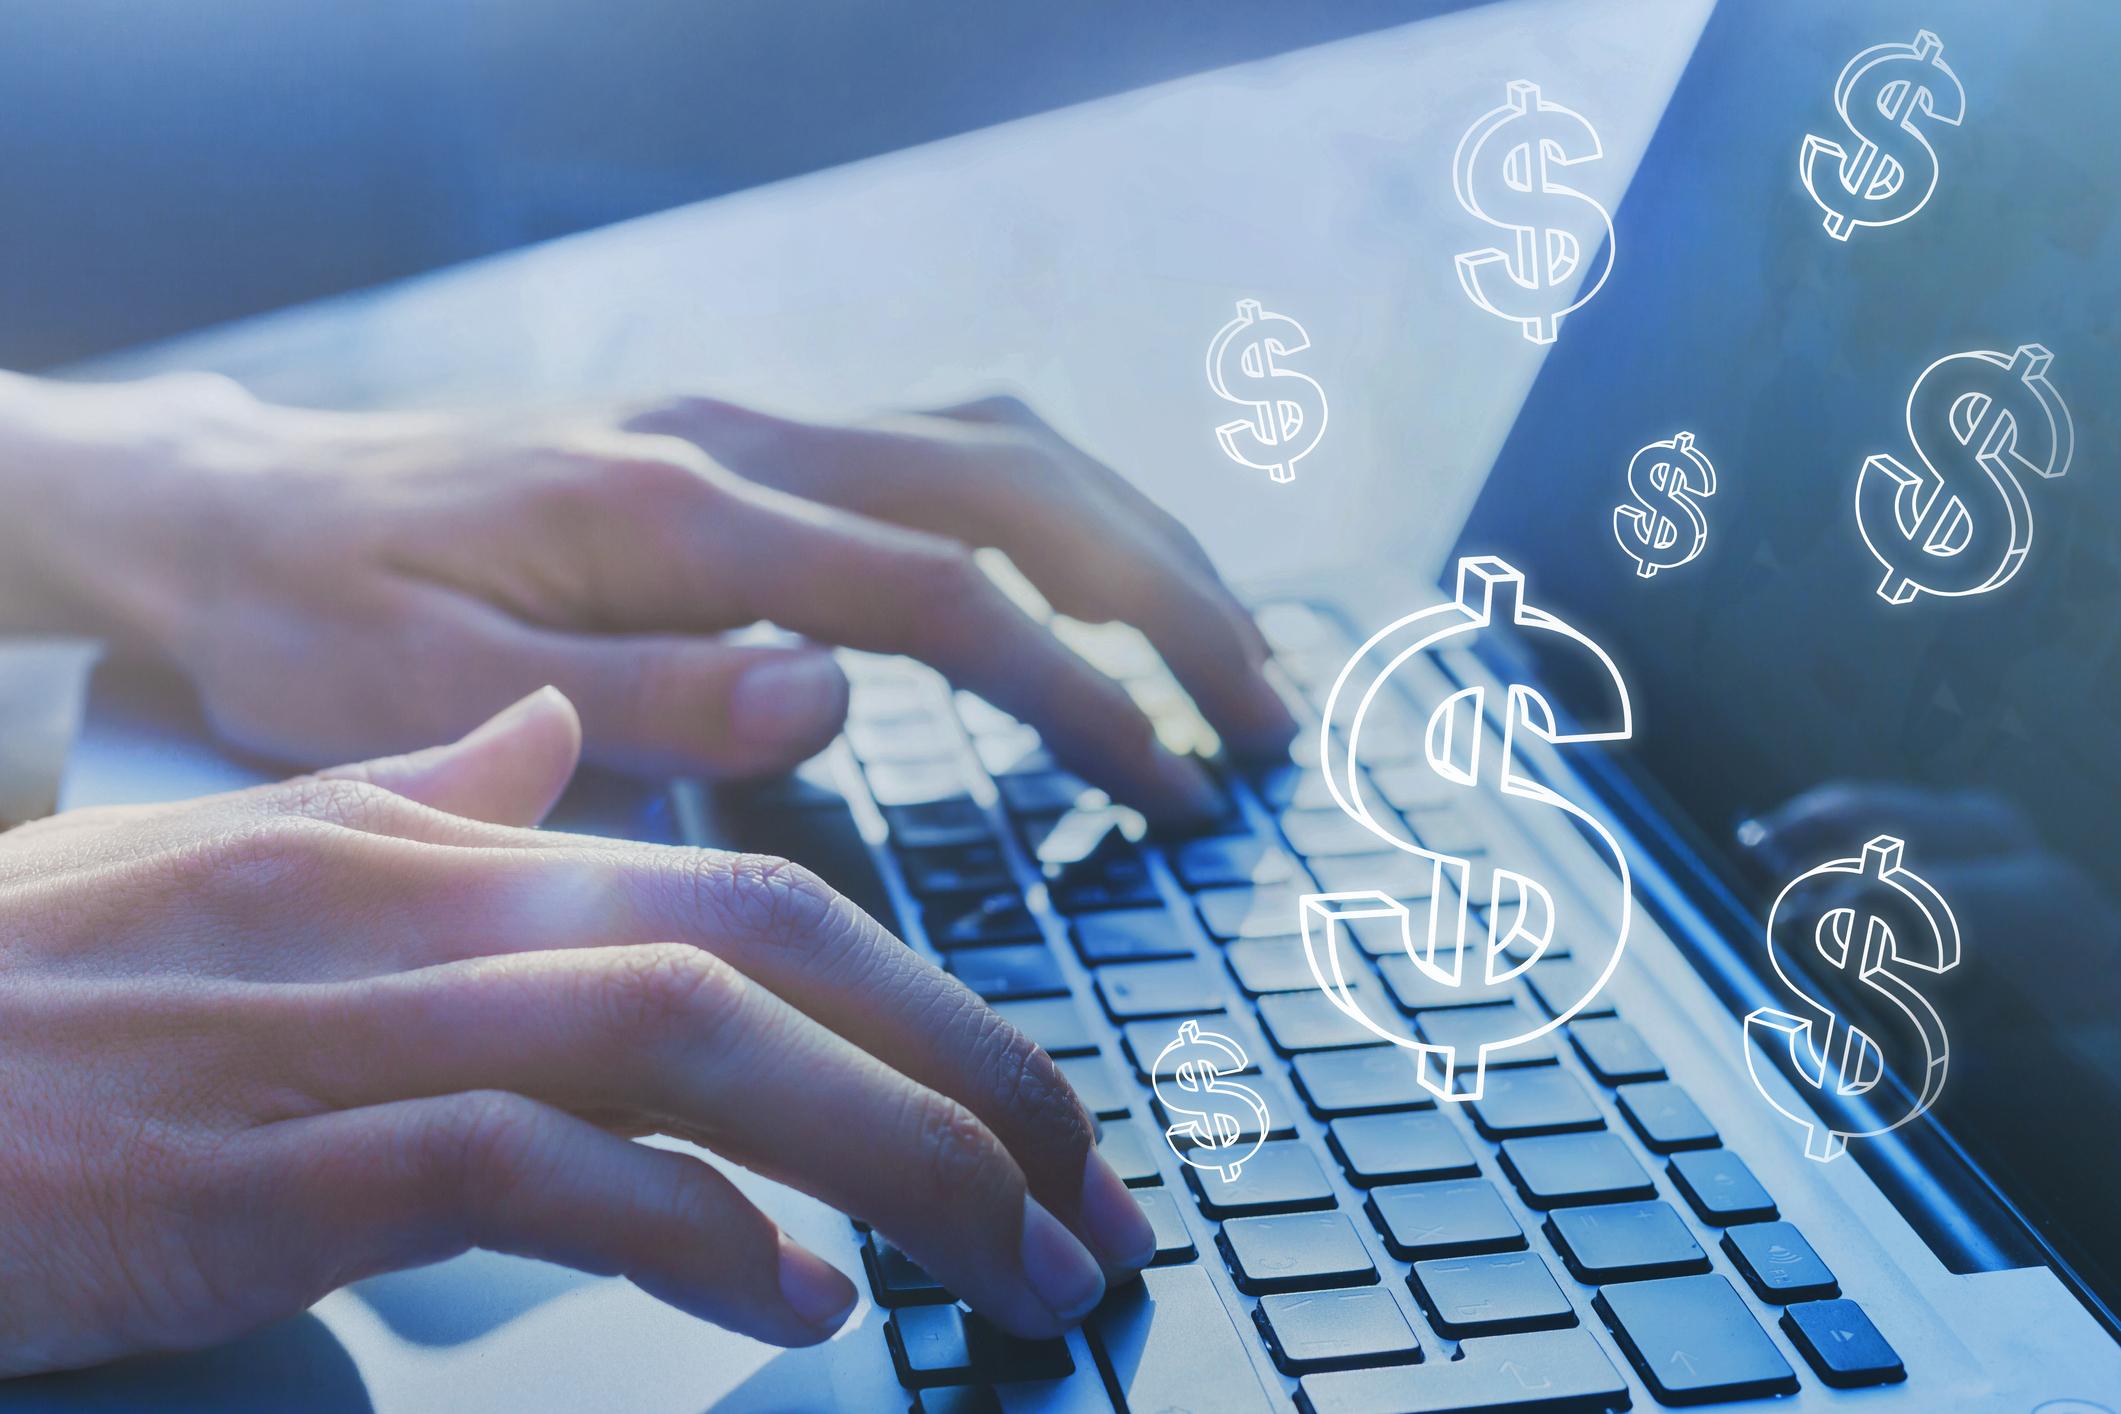 dollar signs around laptop